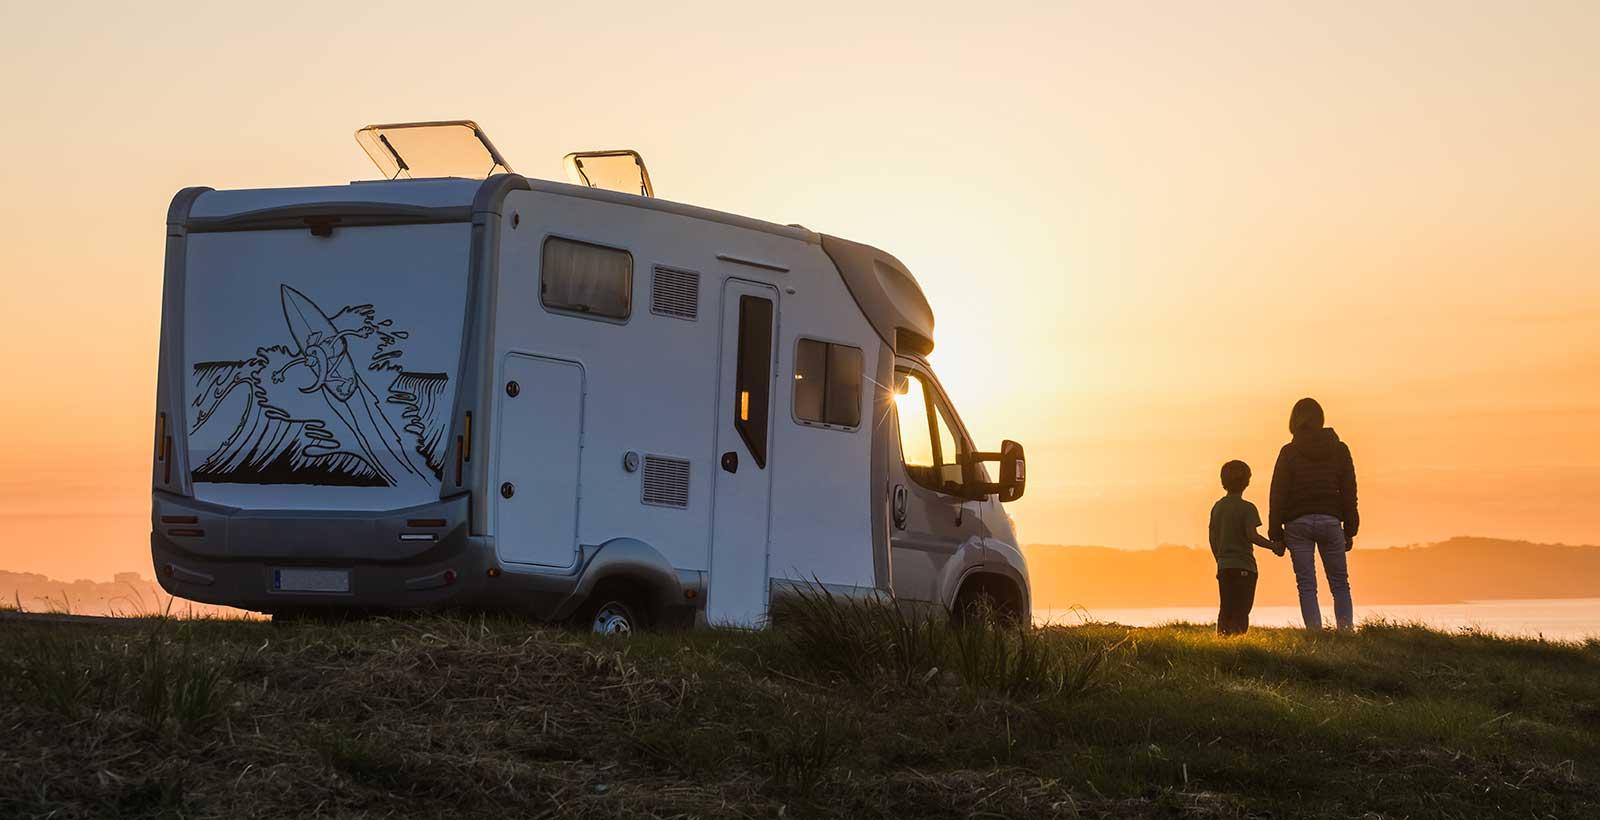 Noleggio a lungo termine camper, convenienza per le tue vacanze.